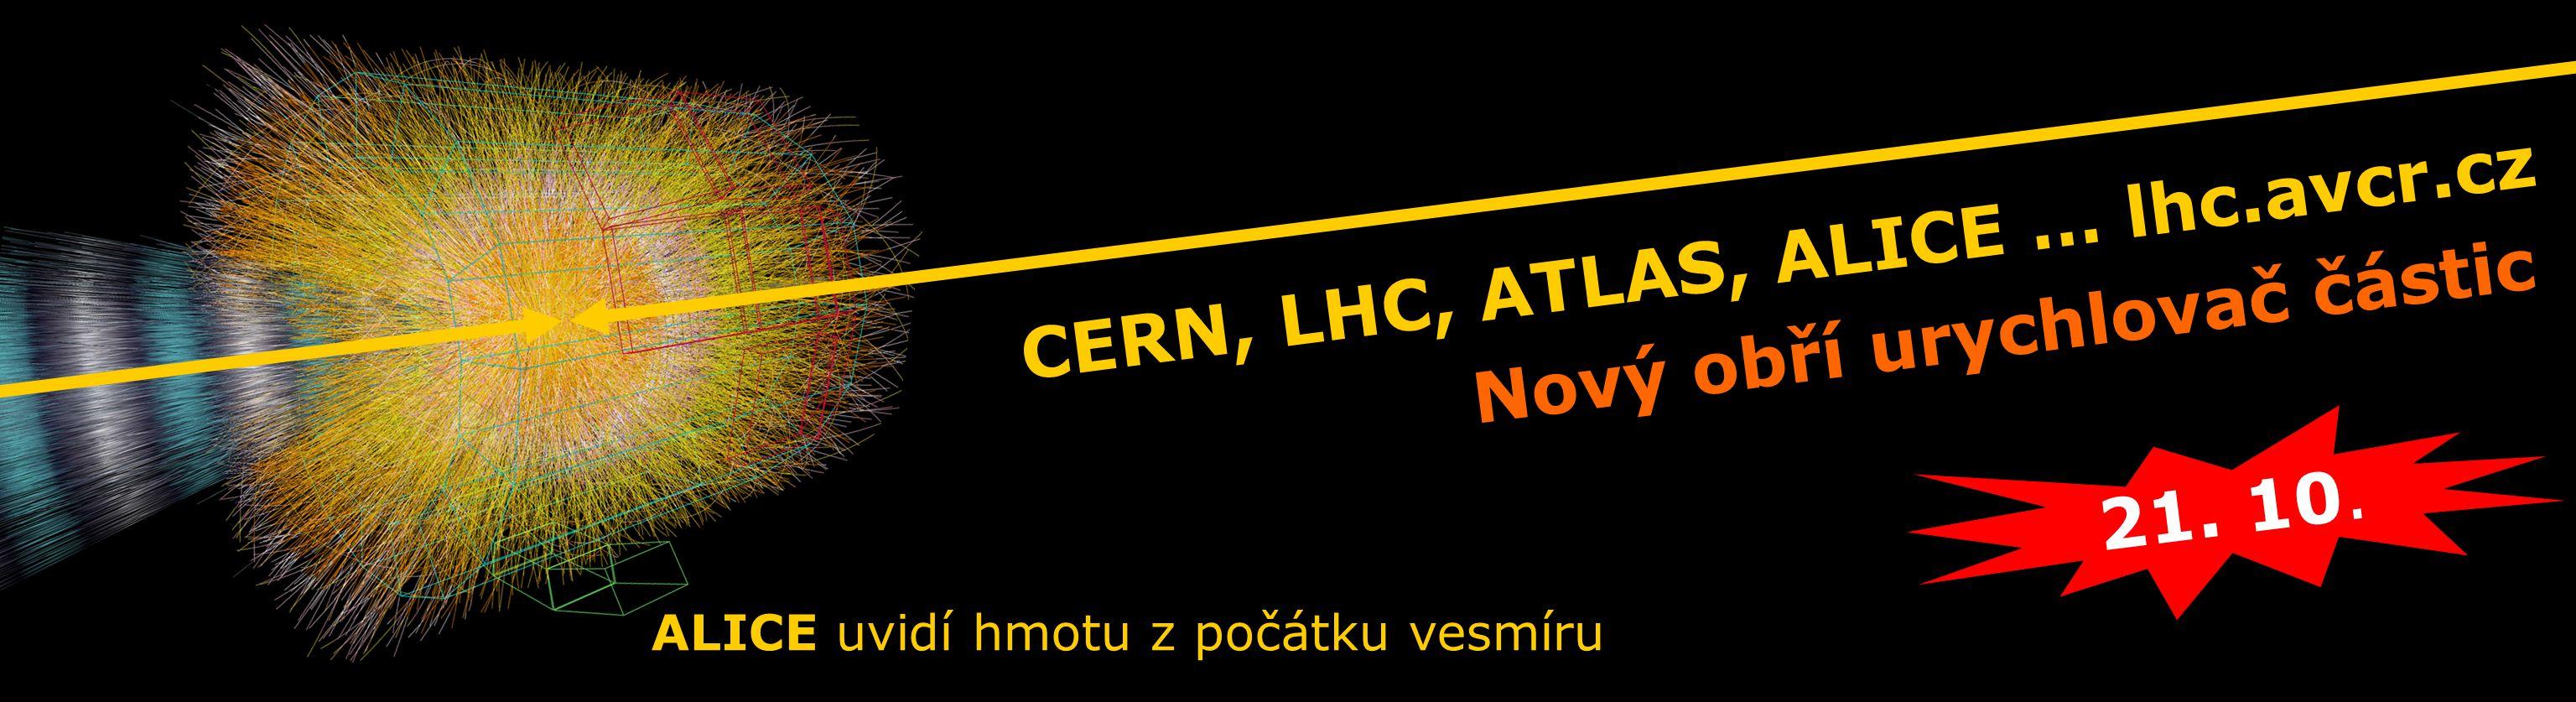 CERN, LHC, ATLAS, ALICE … lhc.avcr.cz 21.10.